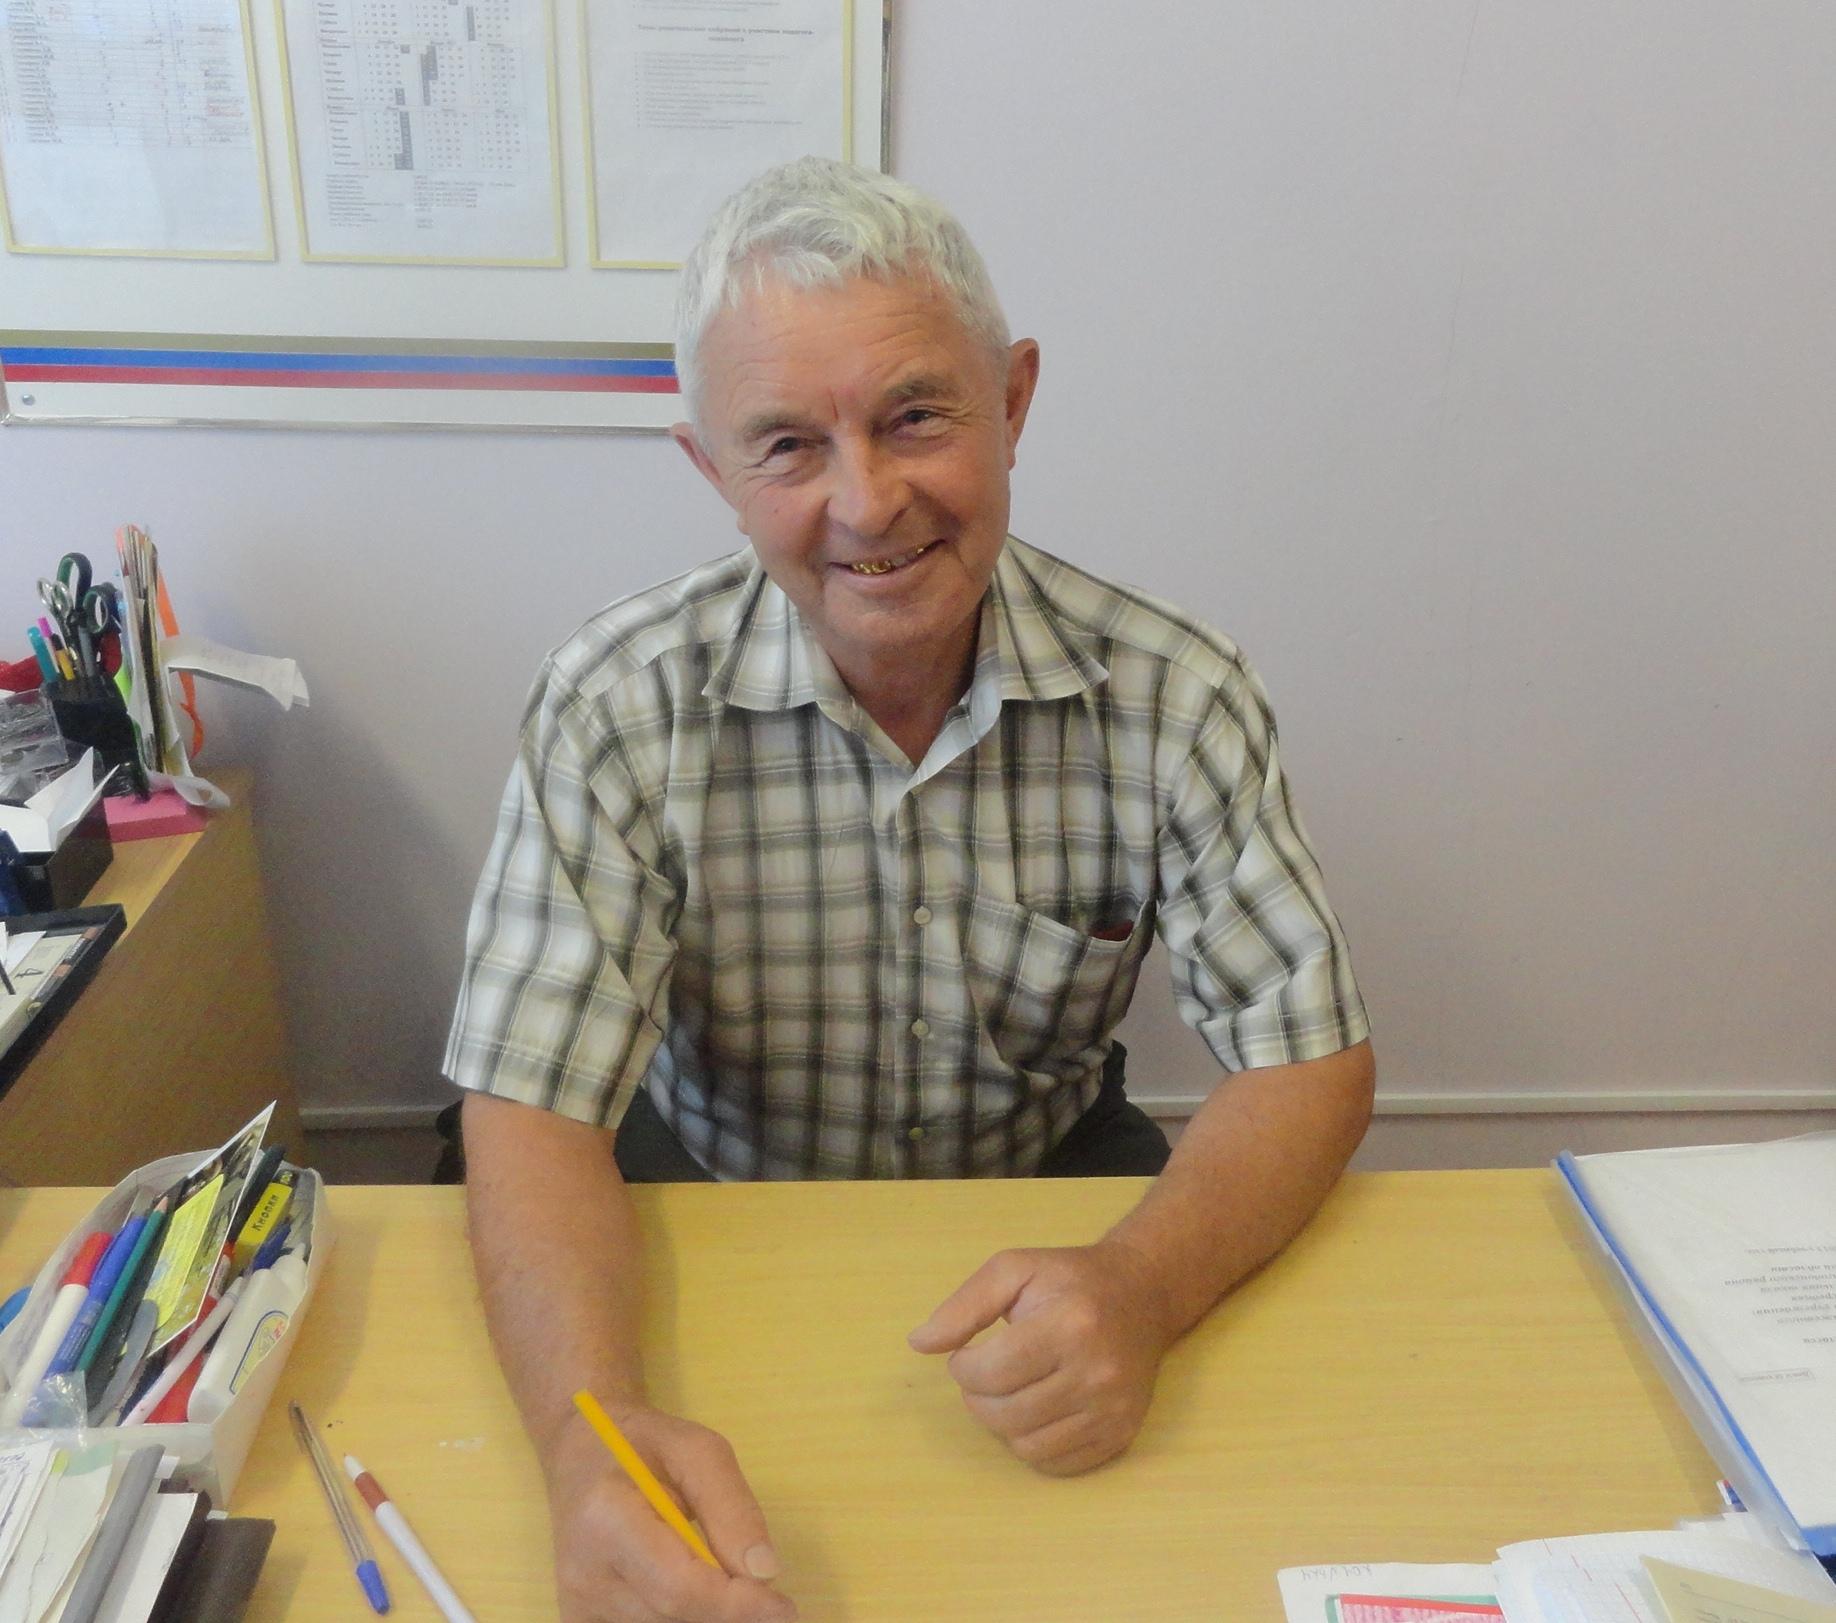 Поздравляем Коржова Владимира Дмитриевича с 75-летним юбилеем